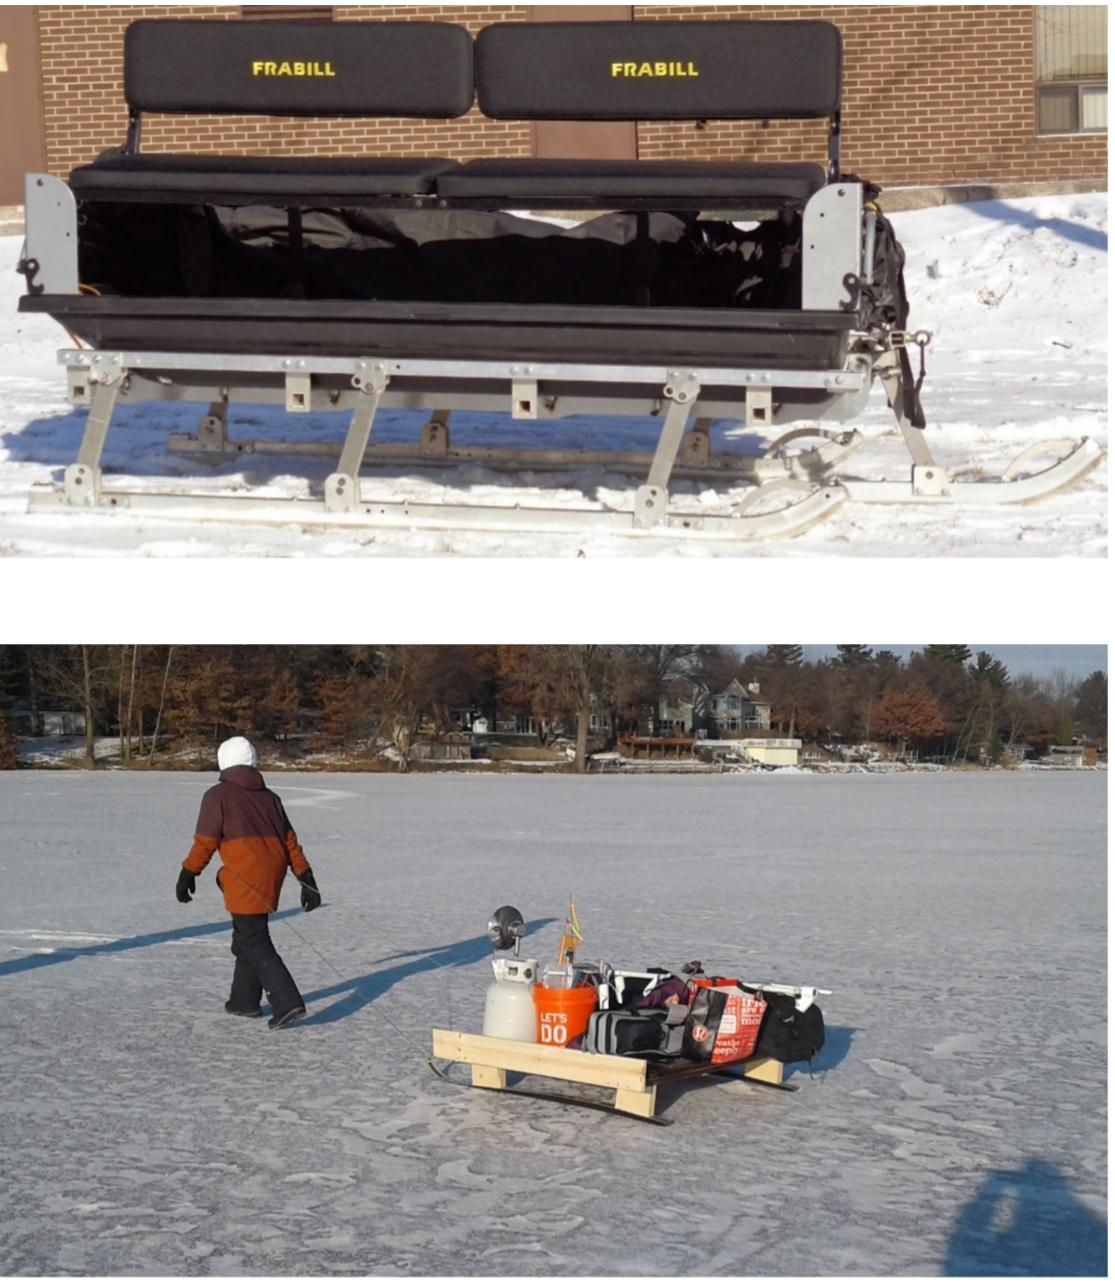 Sled Pulling Harness - Ice Fishing Minnesota - Outdoor